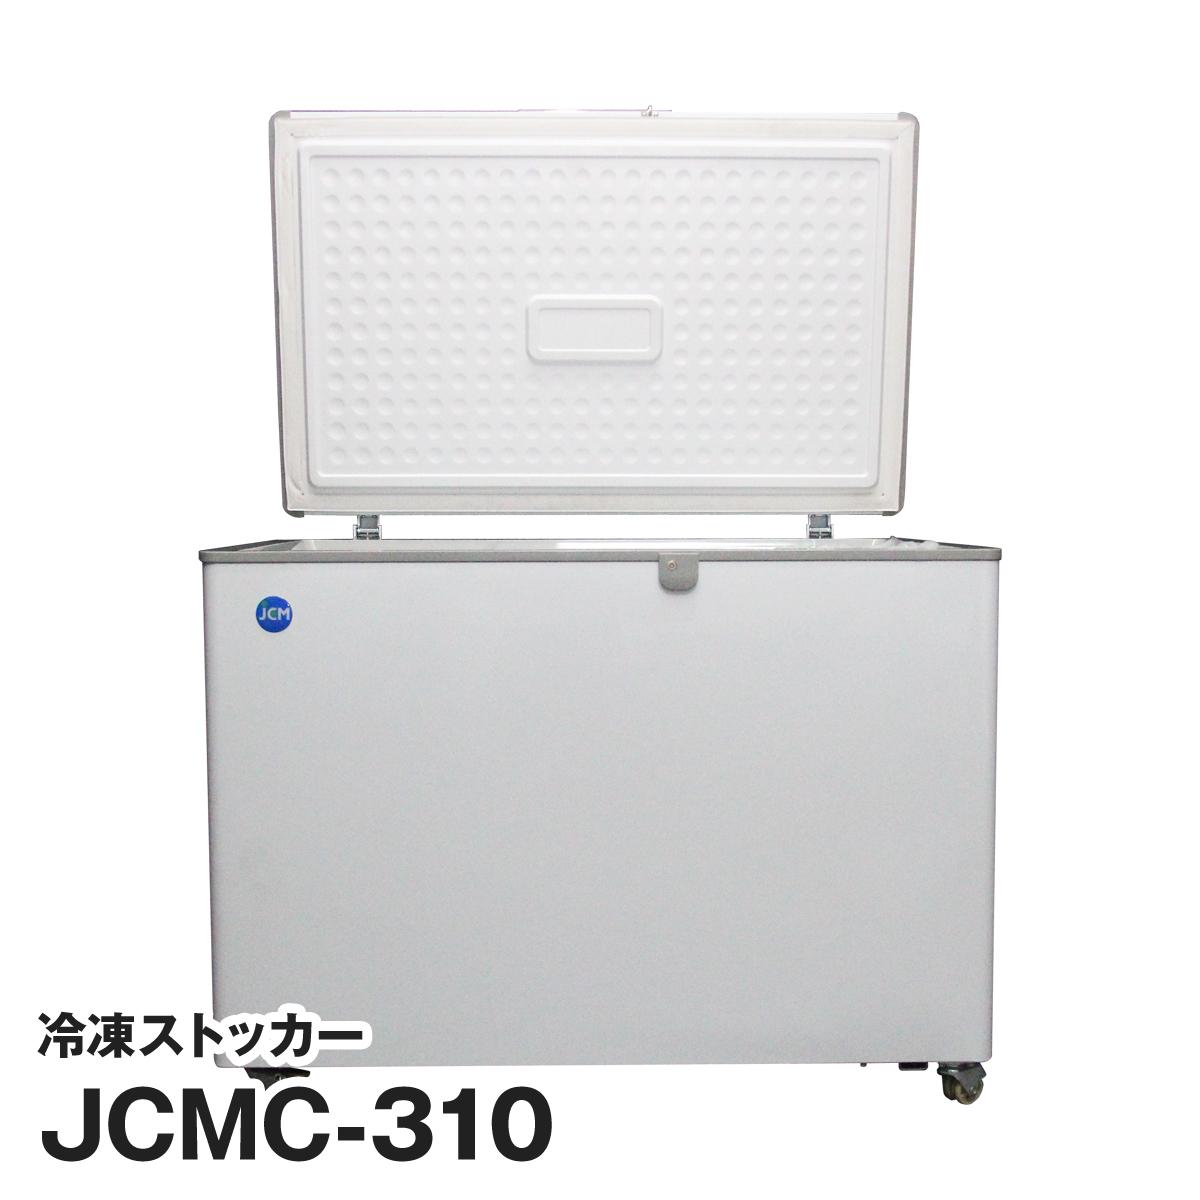 JCM社製 業務用 保冷庫 冷凍庫302L 冷凍ストッカー JCMC-310 新品